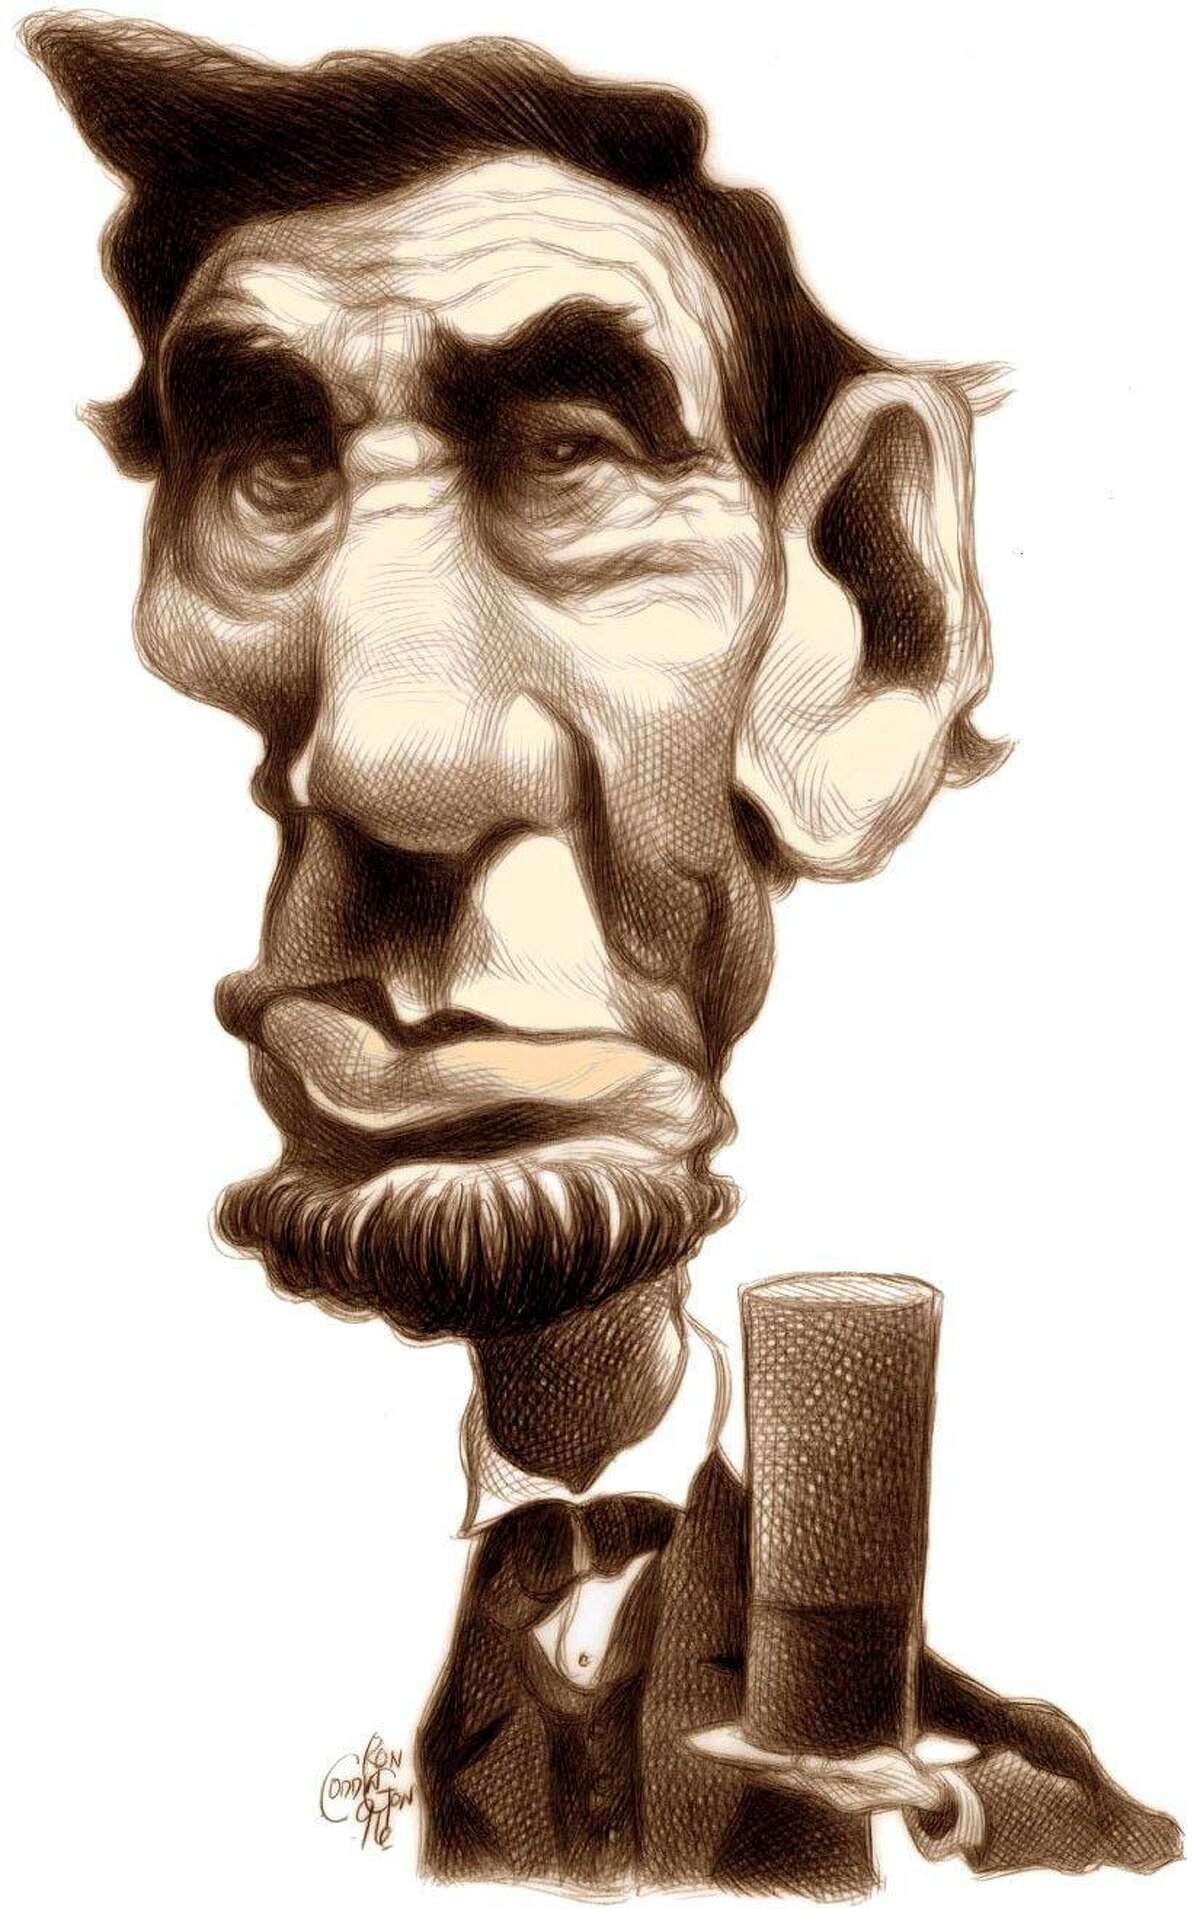 U.S. president Abraham Lincoln by Ron Coddington, KRT, 1996 CATEGORY: CARICATURE SUBJECT: Abraham Lincoln ARTIST: Ron Coddington RESEARCHER: Staff ORIGIN: KRT TYPE: EPS JPEG SIZE: As needed ENTERED: 9/18/96 REVISED: STORY SLUG: krtpresday us, president, lincoln, abraham, politics, color, krt, 1996, coddington. HOUCHRON CAPTION (01/05/2004): None. Lonely Lincoln / Biographer says 16th president was hiding behind that beard.